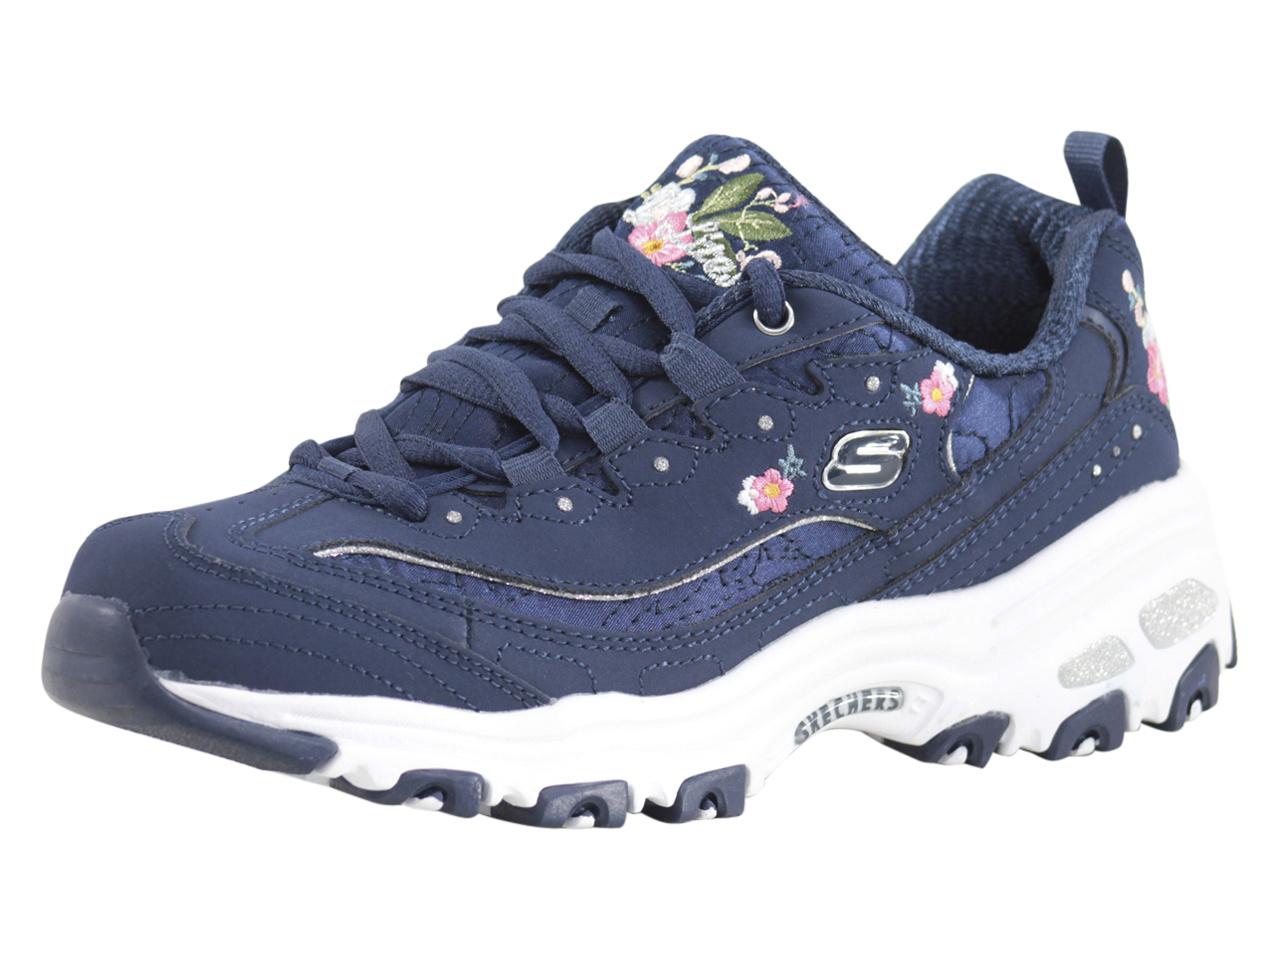 6ba1589595e Details about Skechers Women's D'Lites Bright Blossoms Navy Memory Foam  Sneakers Shoes